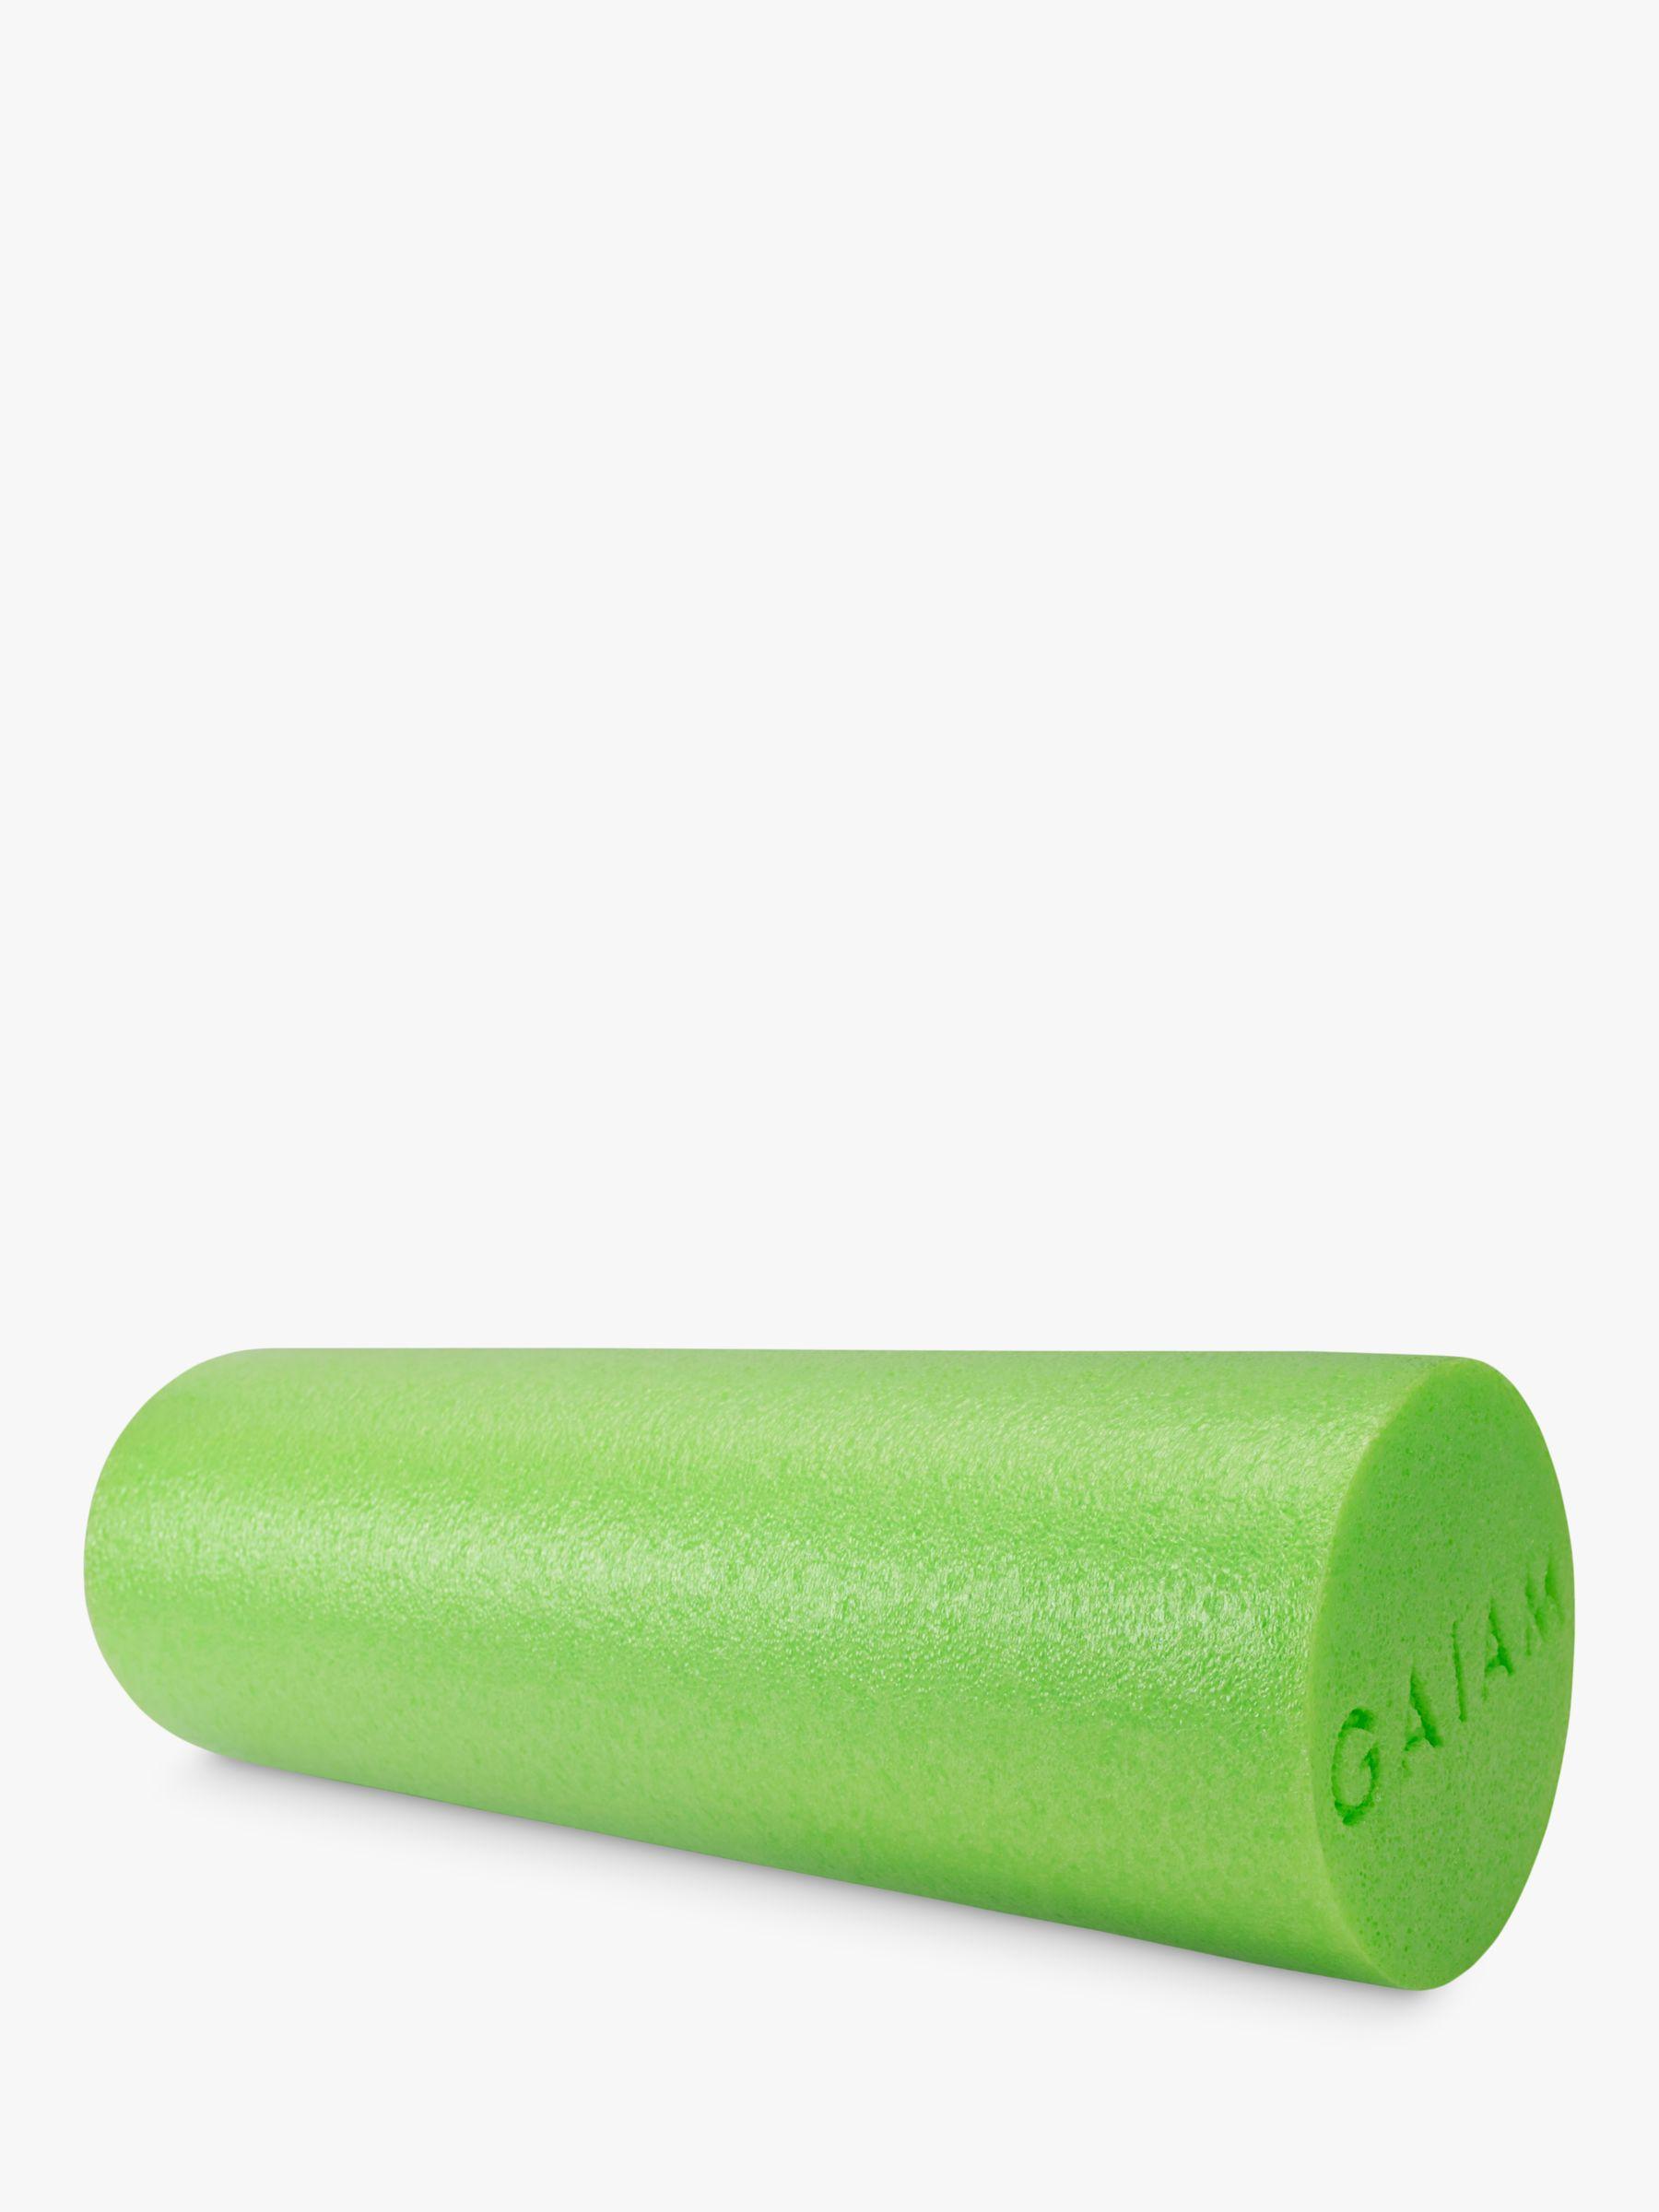 Gaiam Gaiam Muscle Therapy Foam Roller, Green